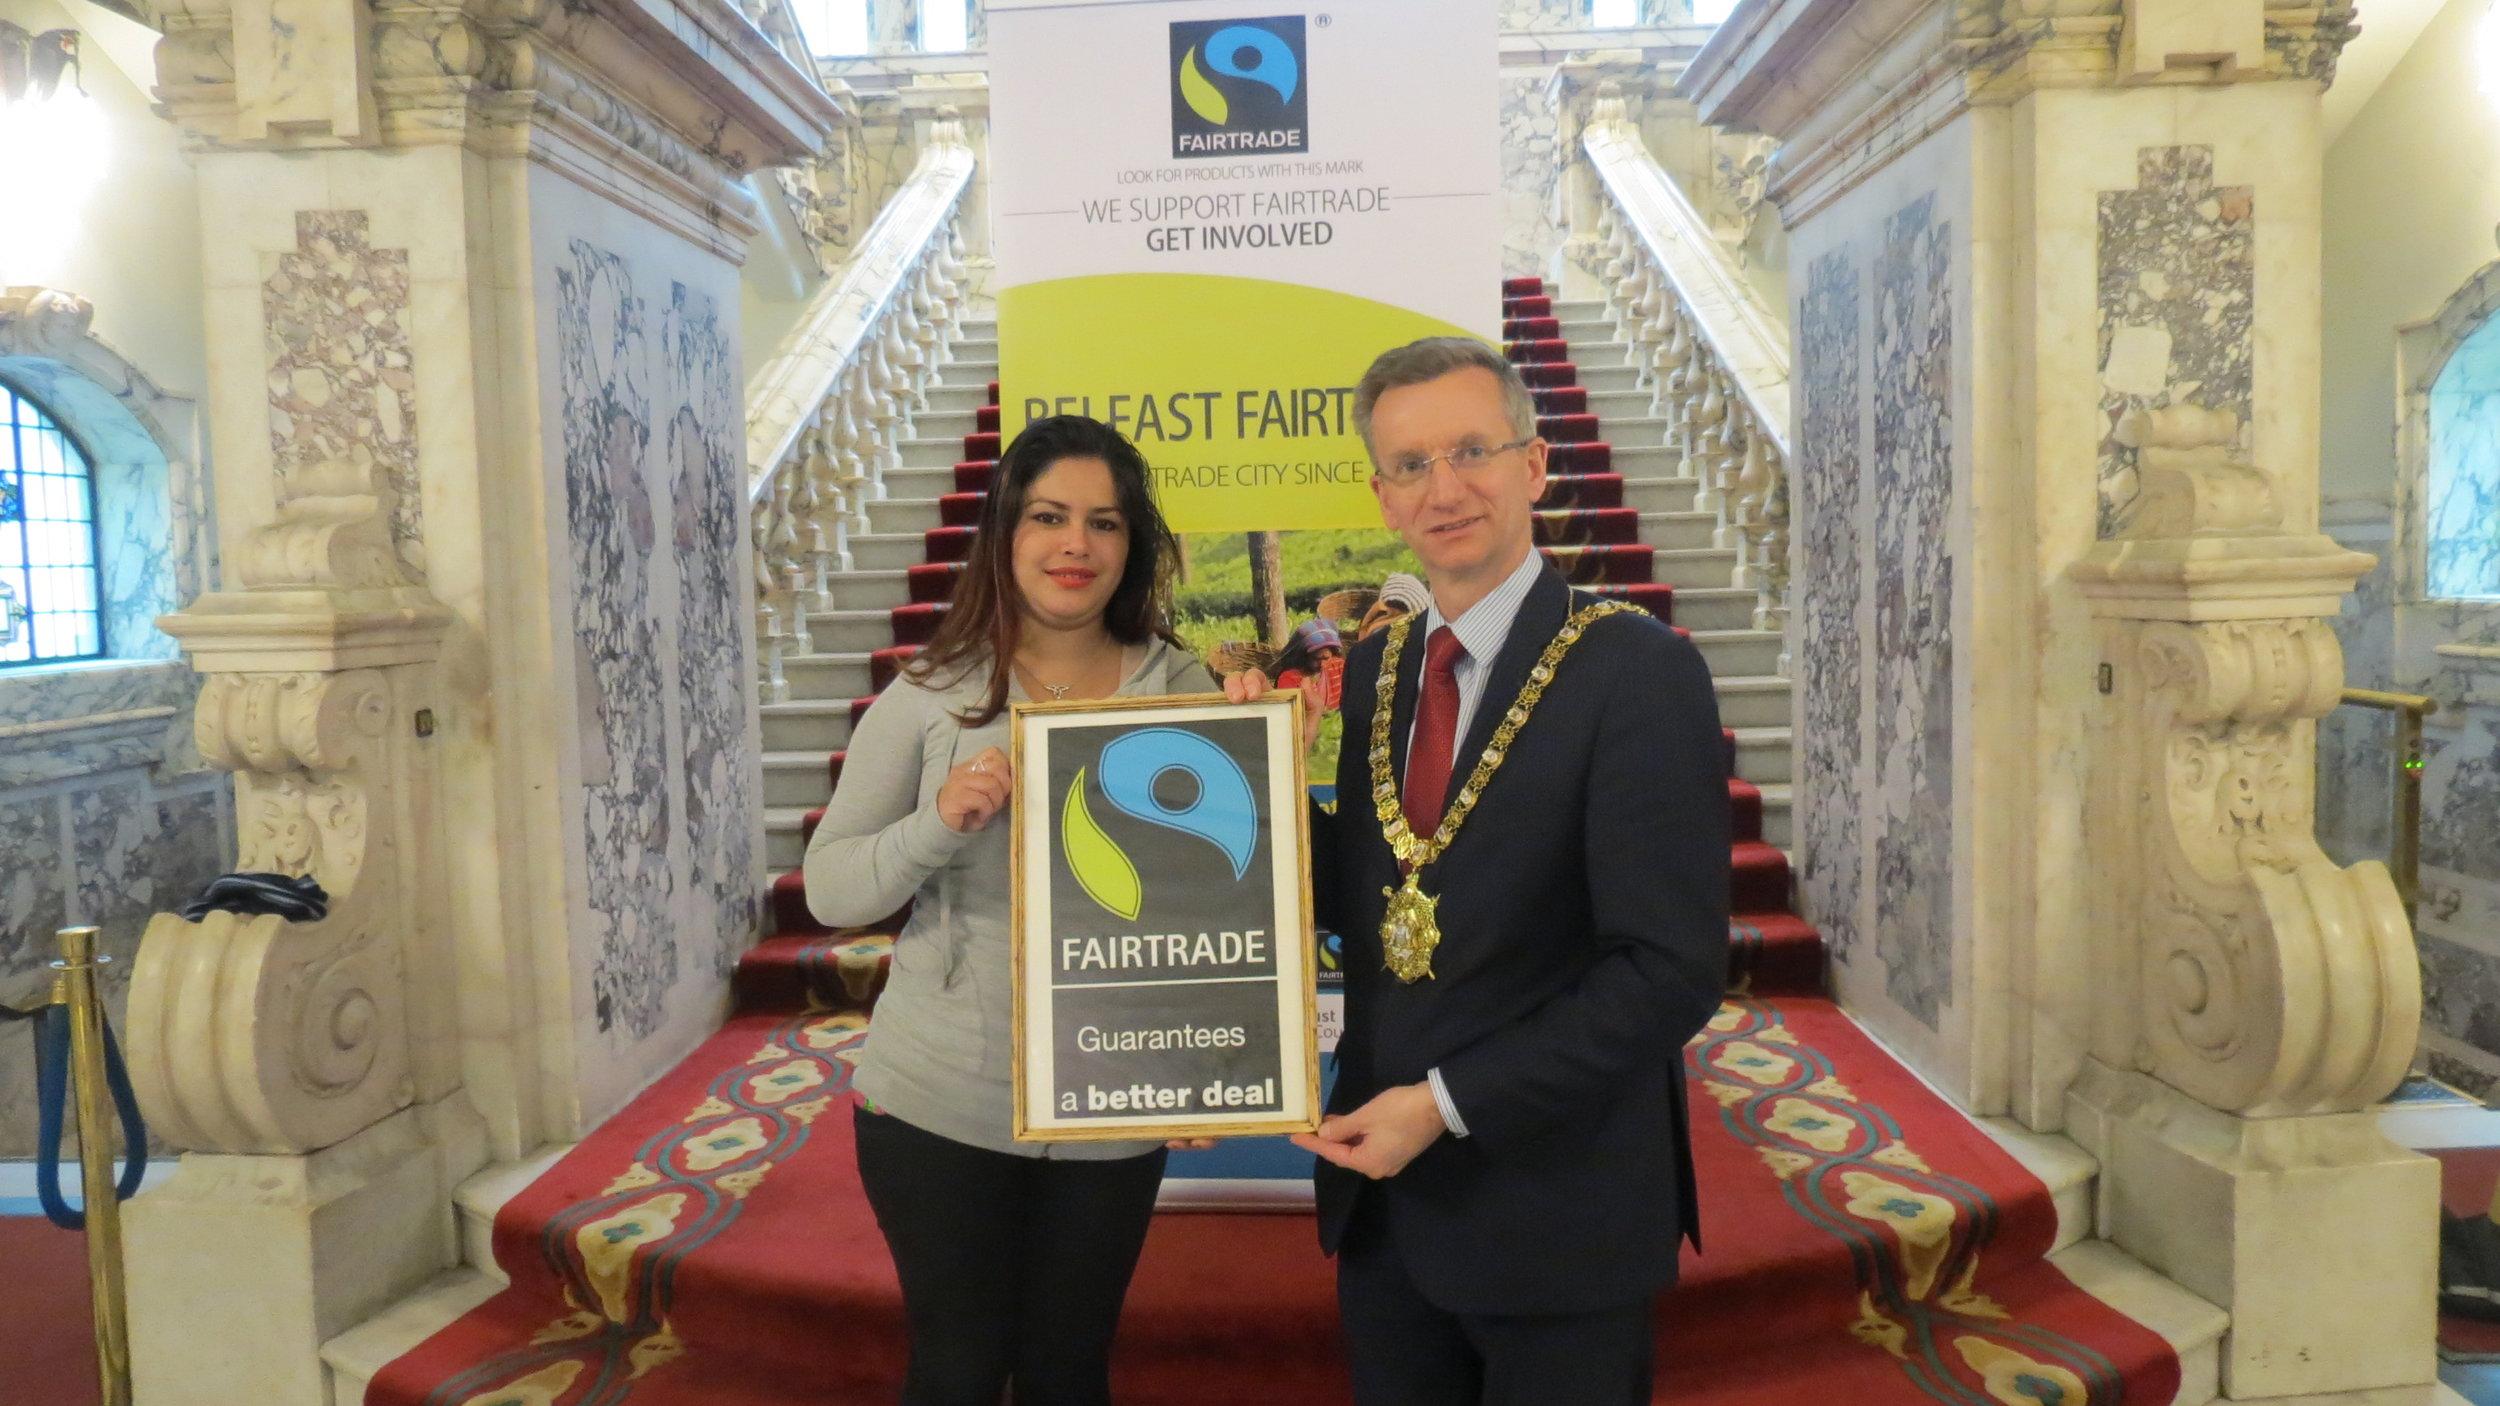 Lord Mayor Fairtrade.JPG